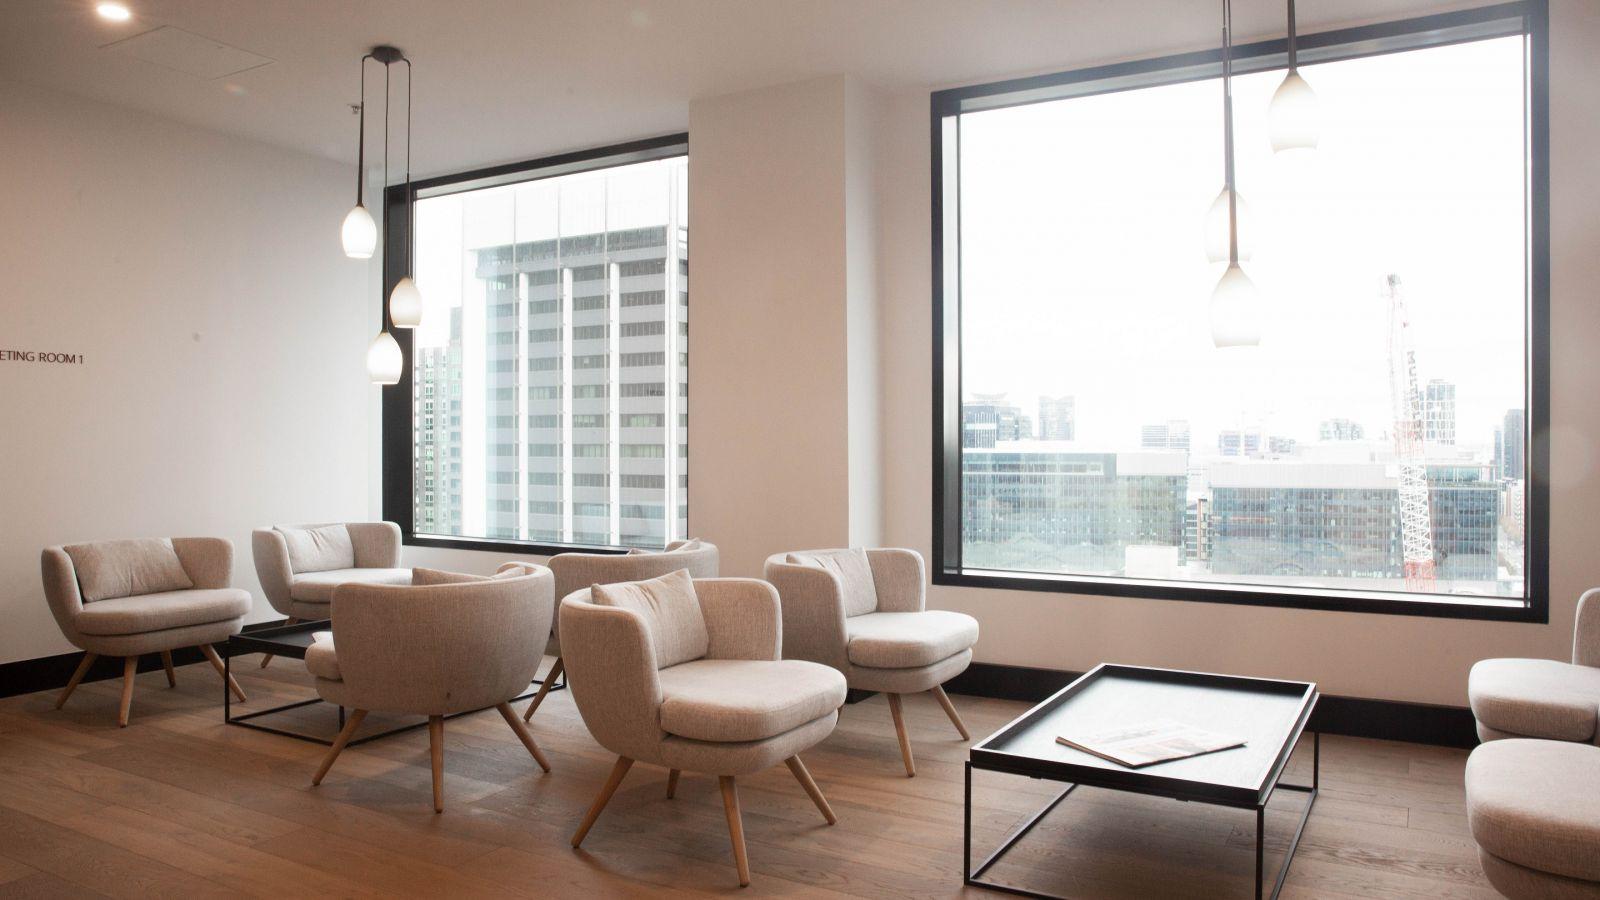 Commercial Interior Design v2